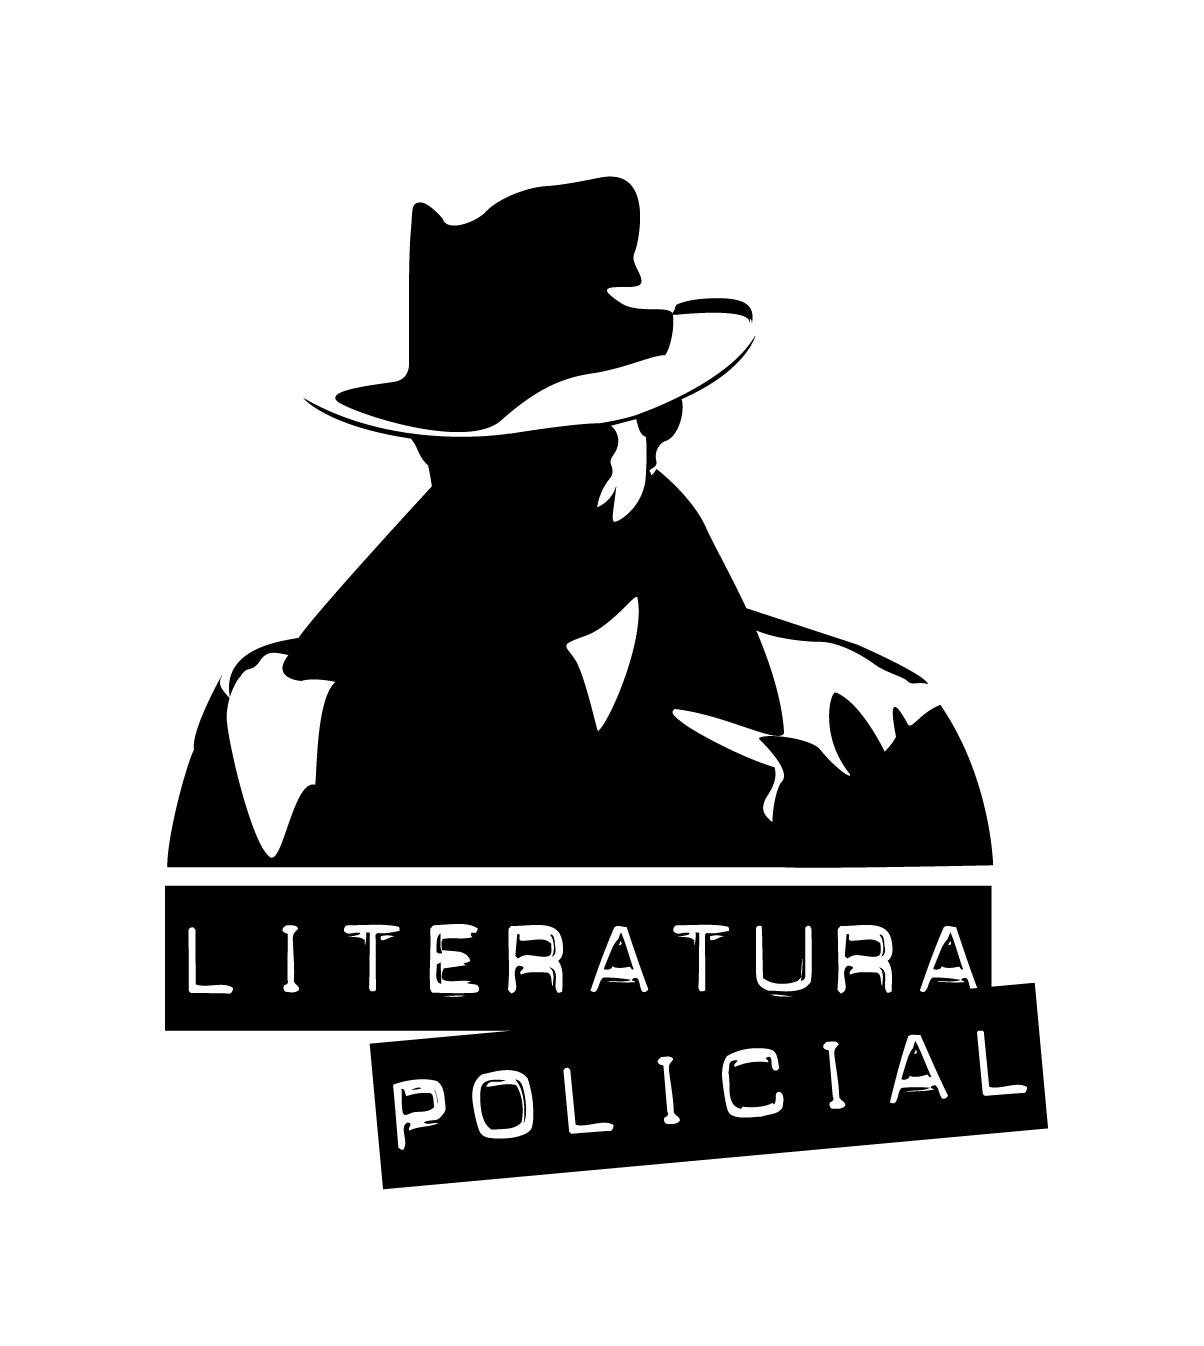 Logo_Literaturapolicial.jpg